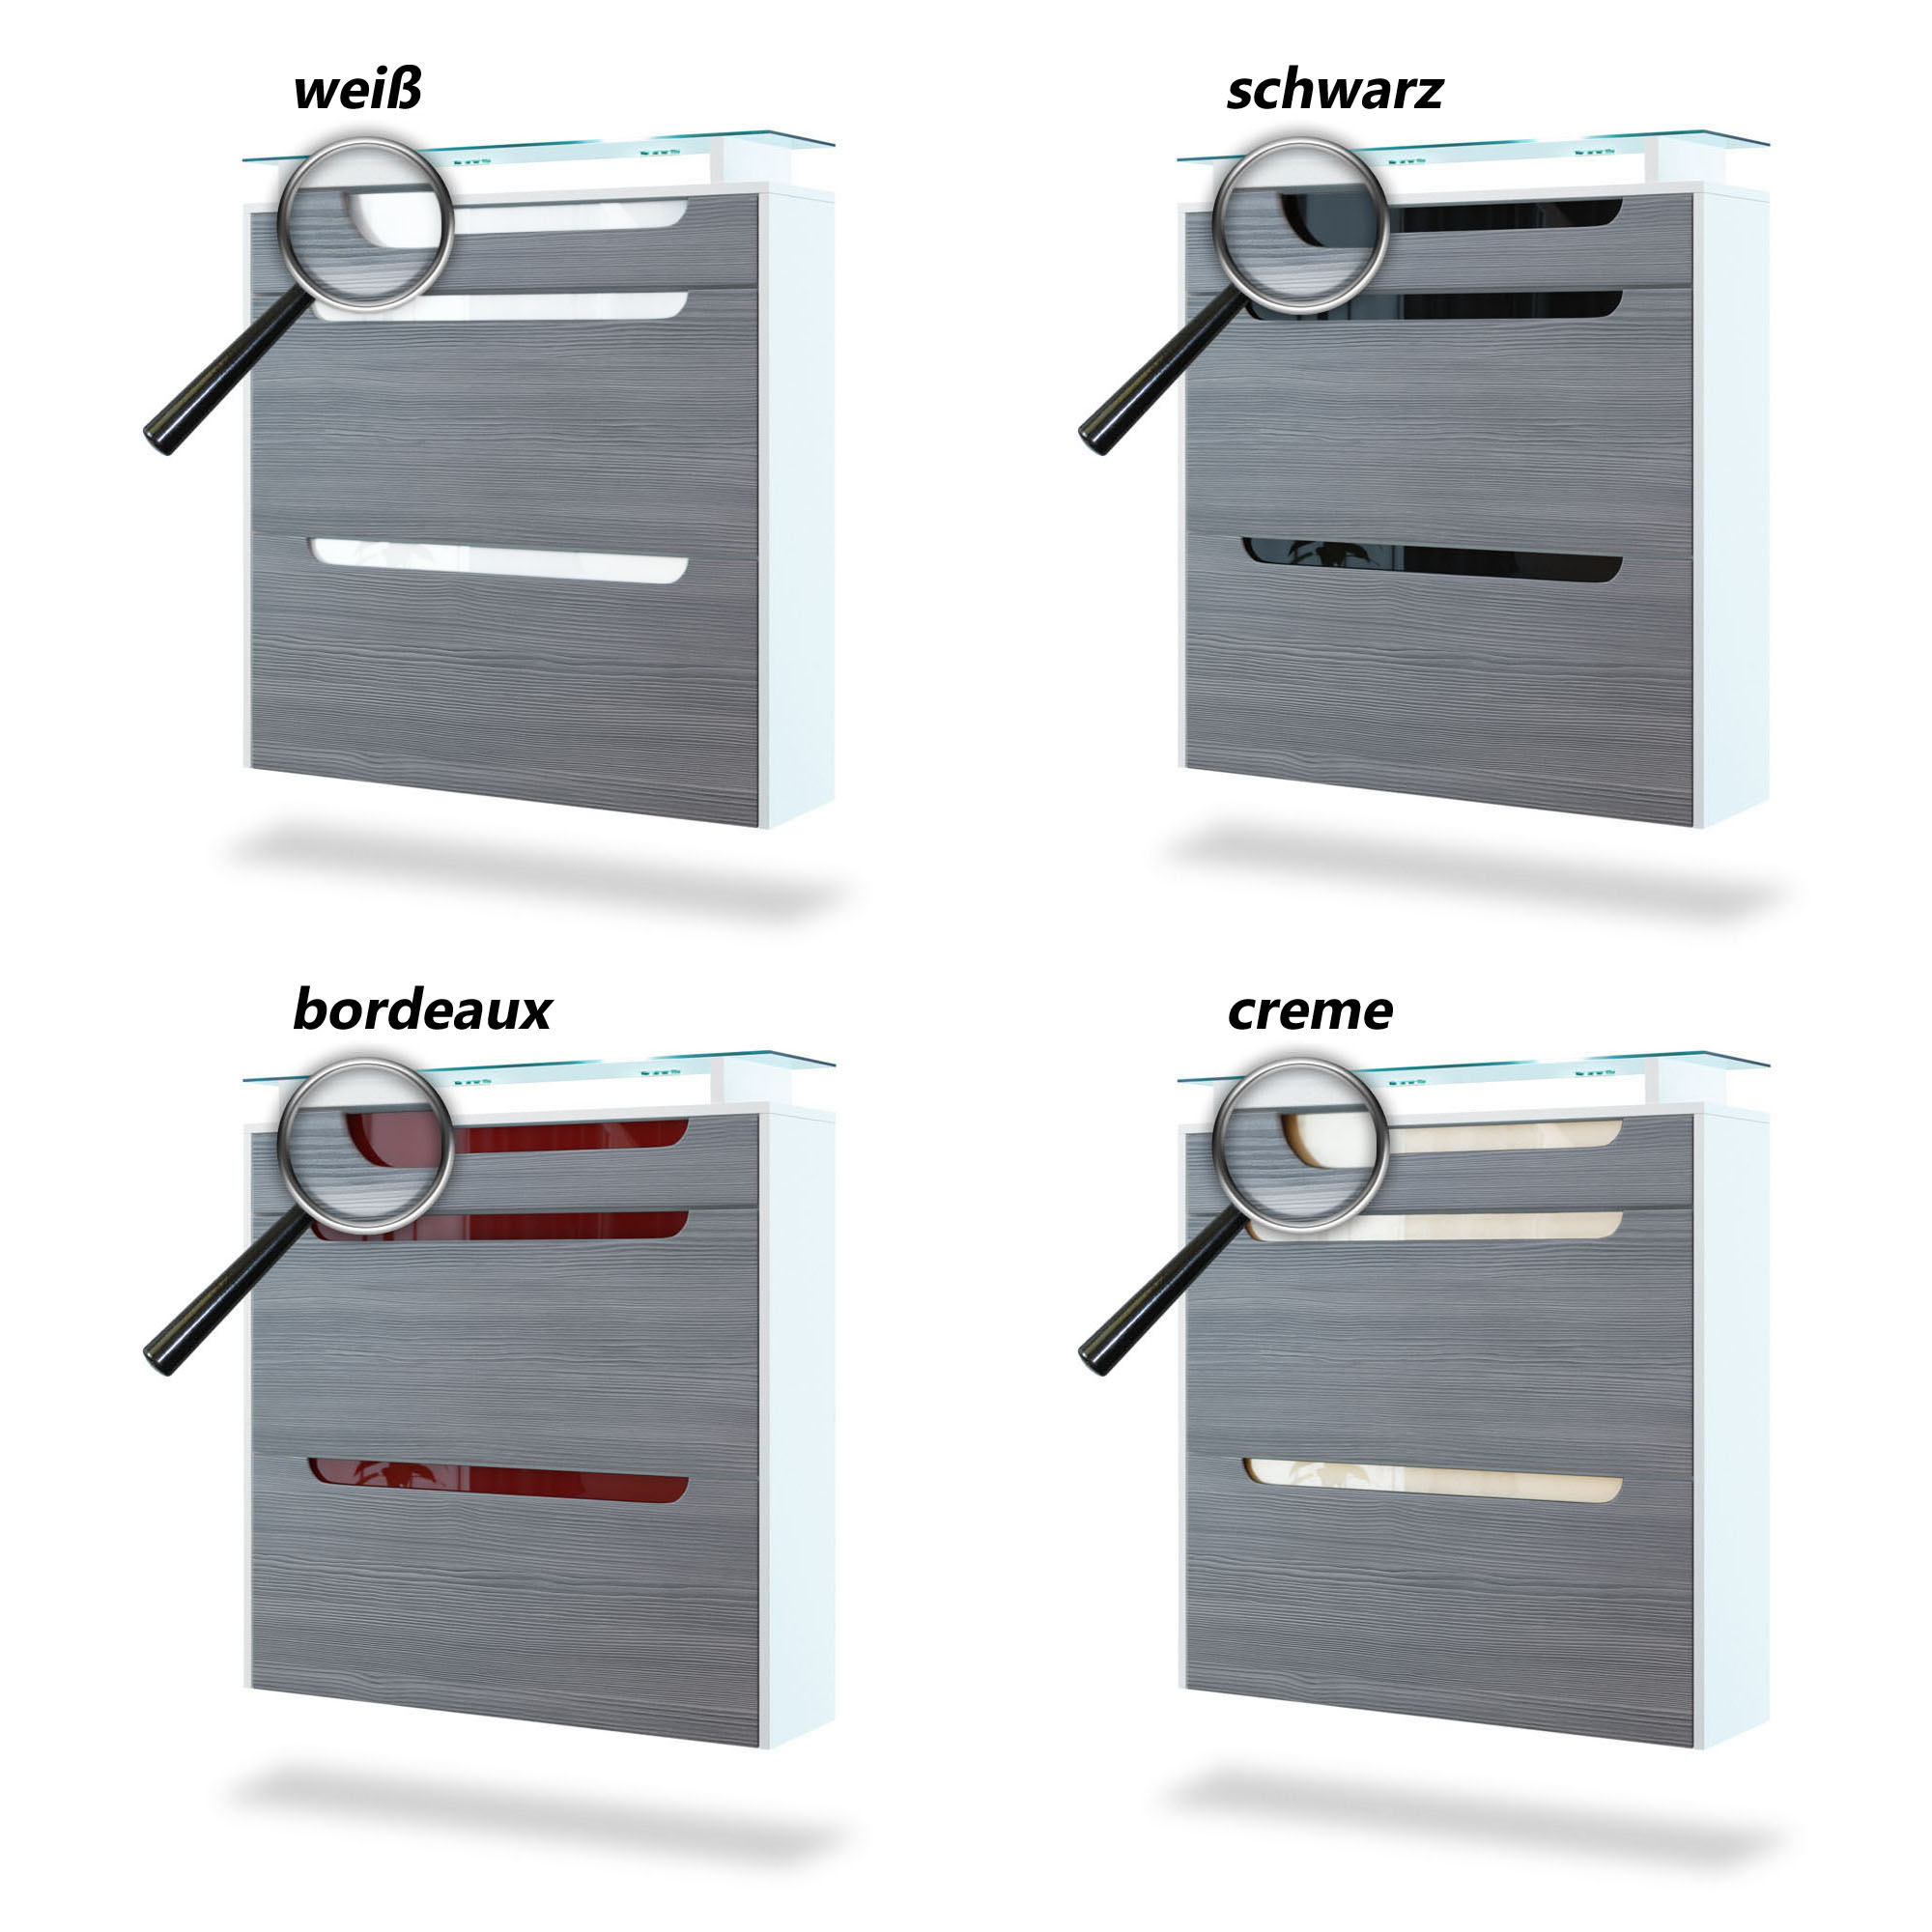 schuhschrank schuhkipper h ngeschuhschrank annie in wei. Black Bedroom Furniture Sets. Home Design Ideas